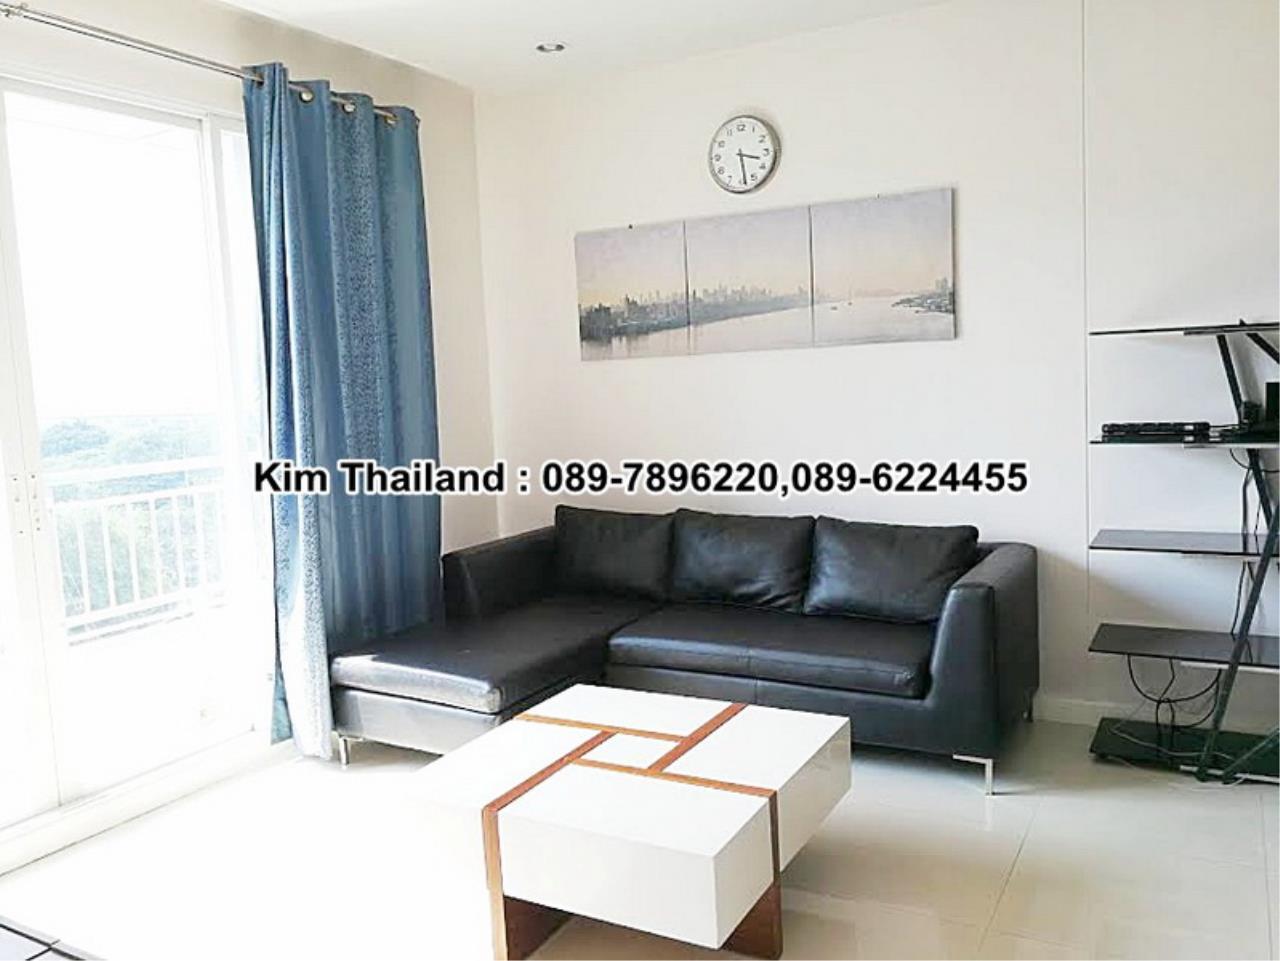 BKKcondorental Agency's For rent, Circle Condominium.  Area 76 sq.m. 2 bedrooms. Rental 35000THB/month. 5